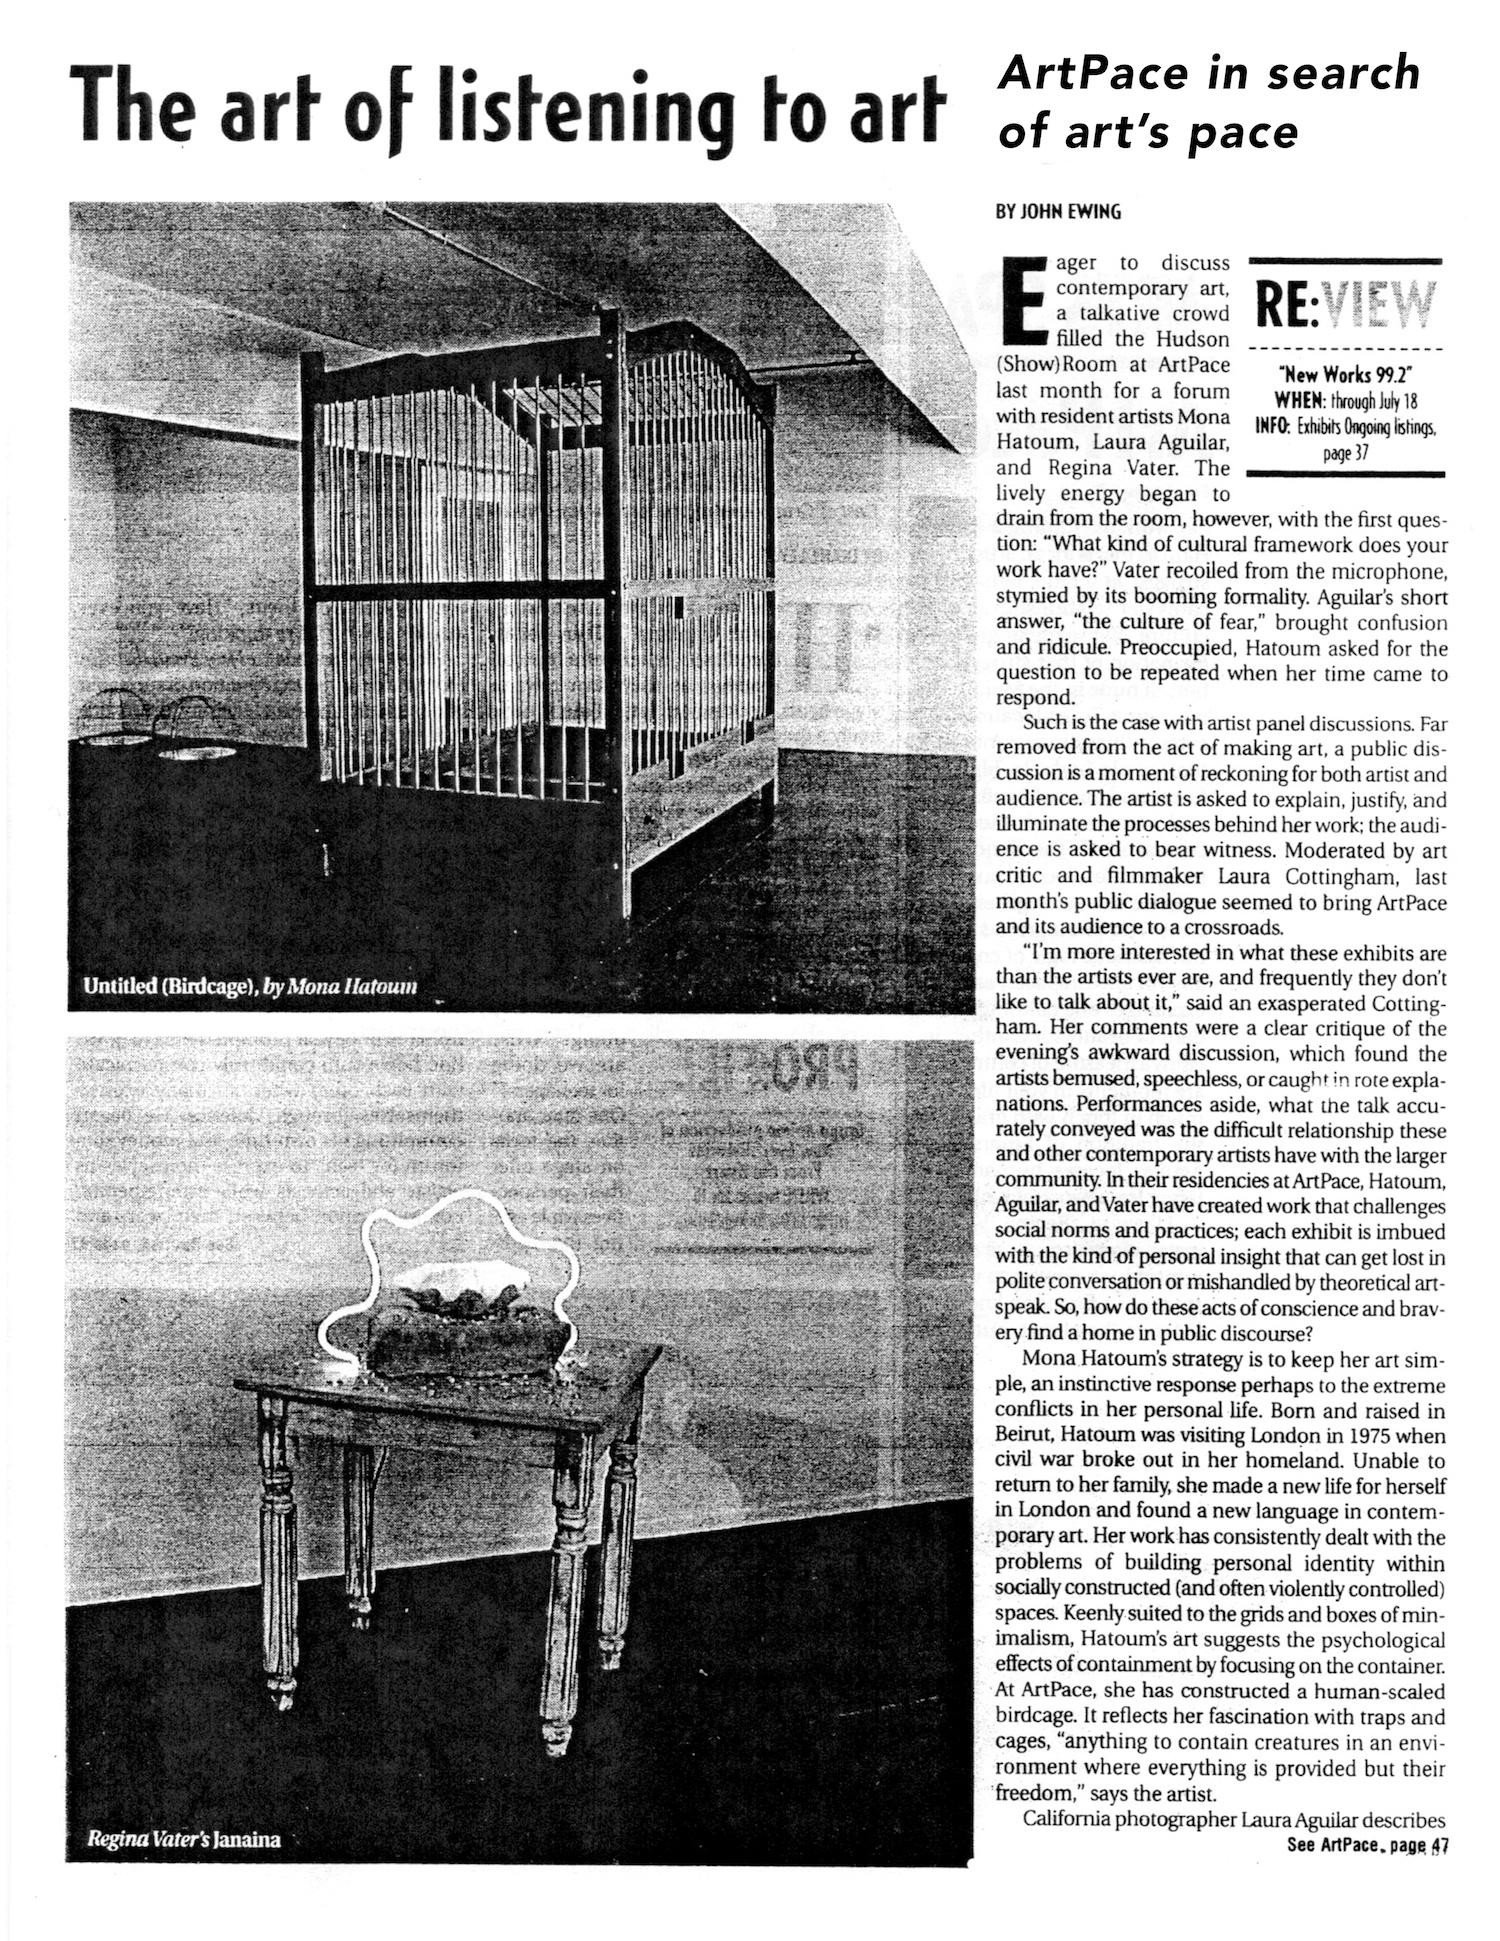 SC_1999_July 8-14_Artpace